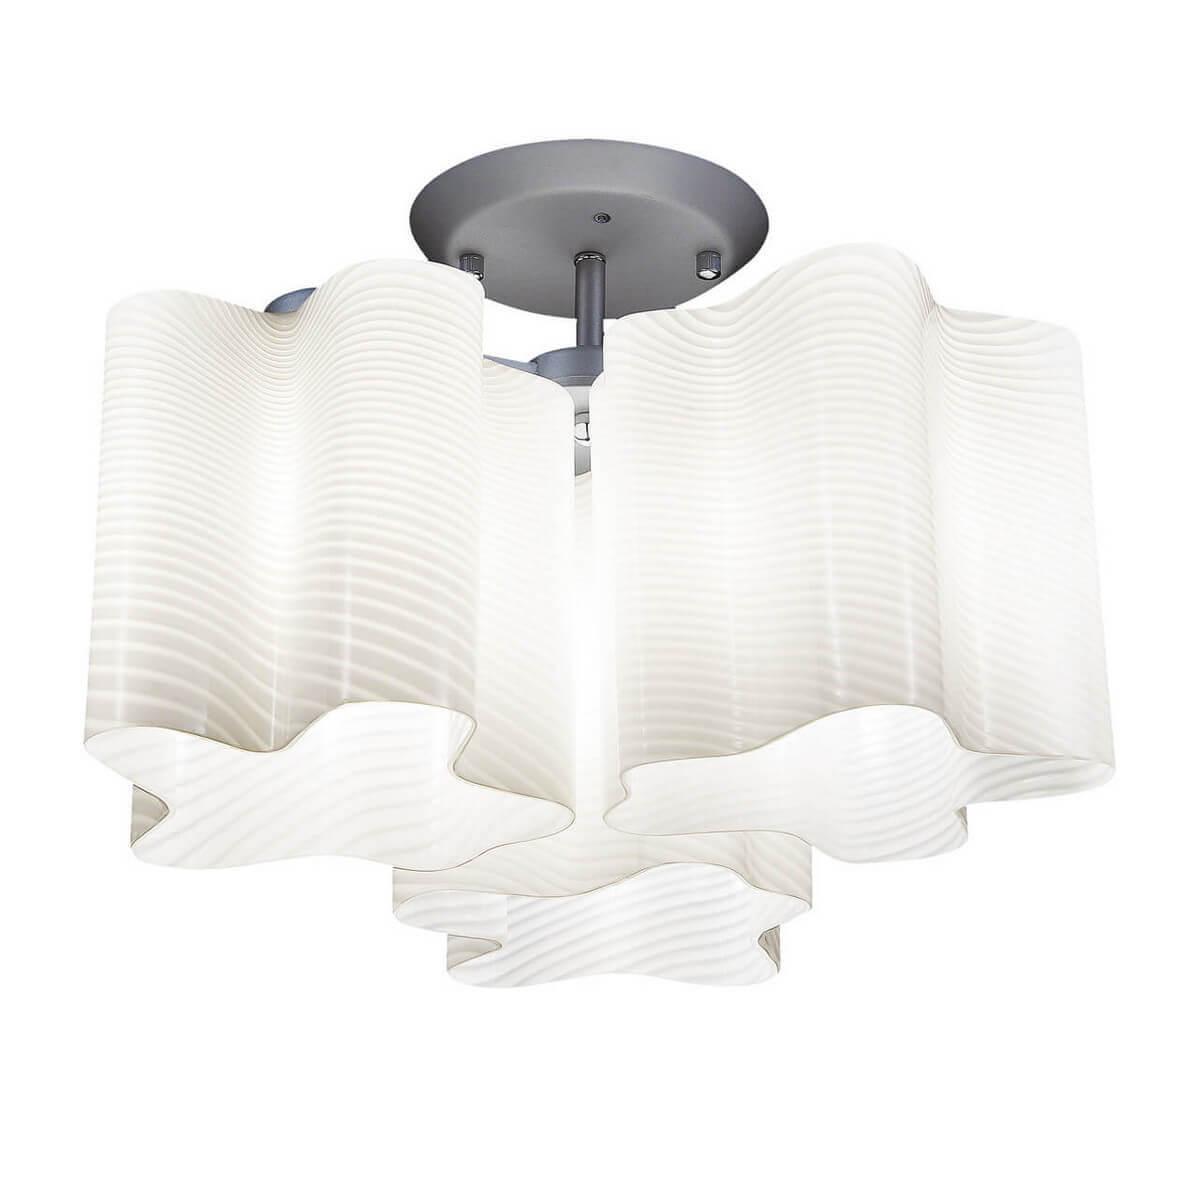 Потолочная люстра Lightstar Nubi Ondoso 802031 lightstar 802130 md998 3 подвес nubi 3х40w e27 хром белый шт